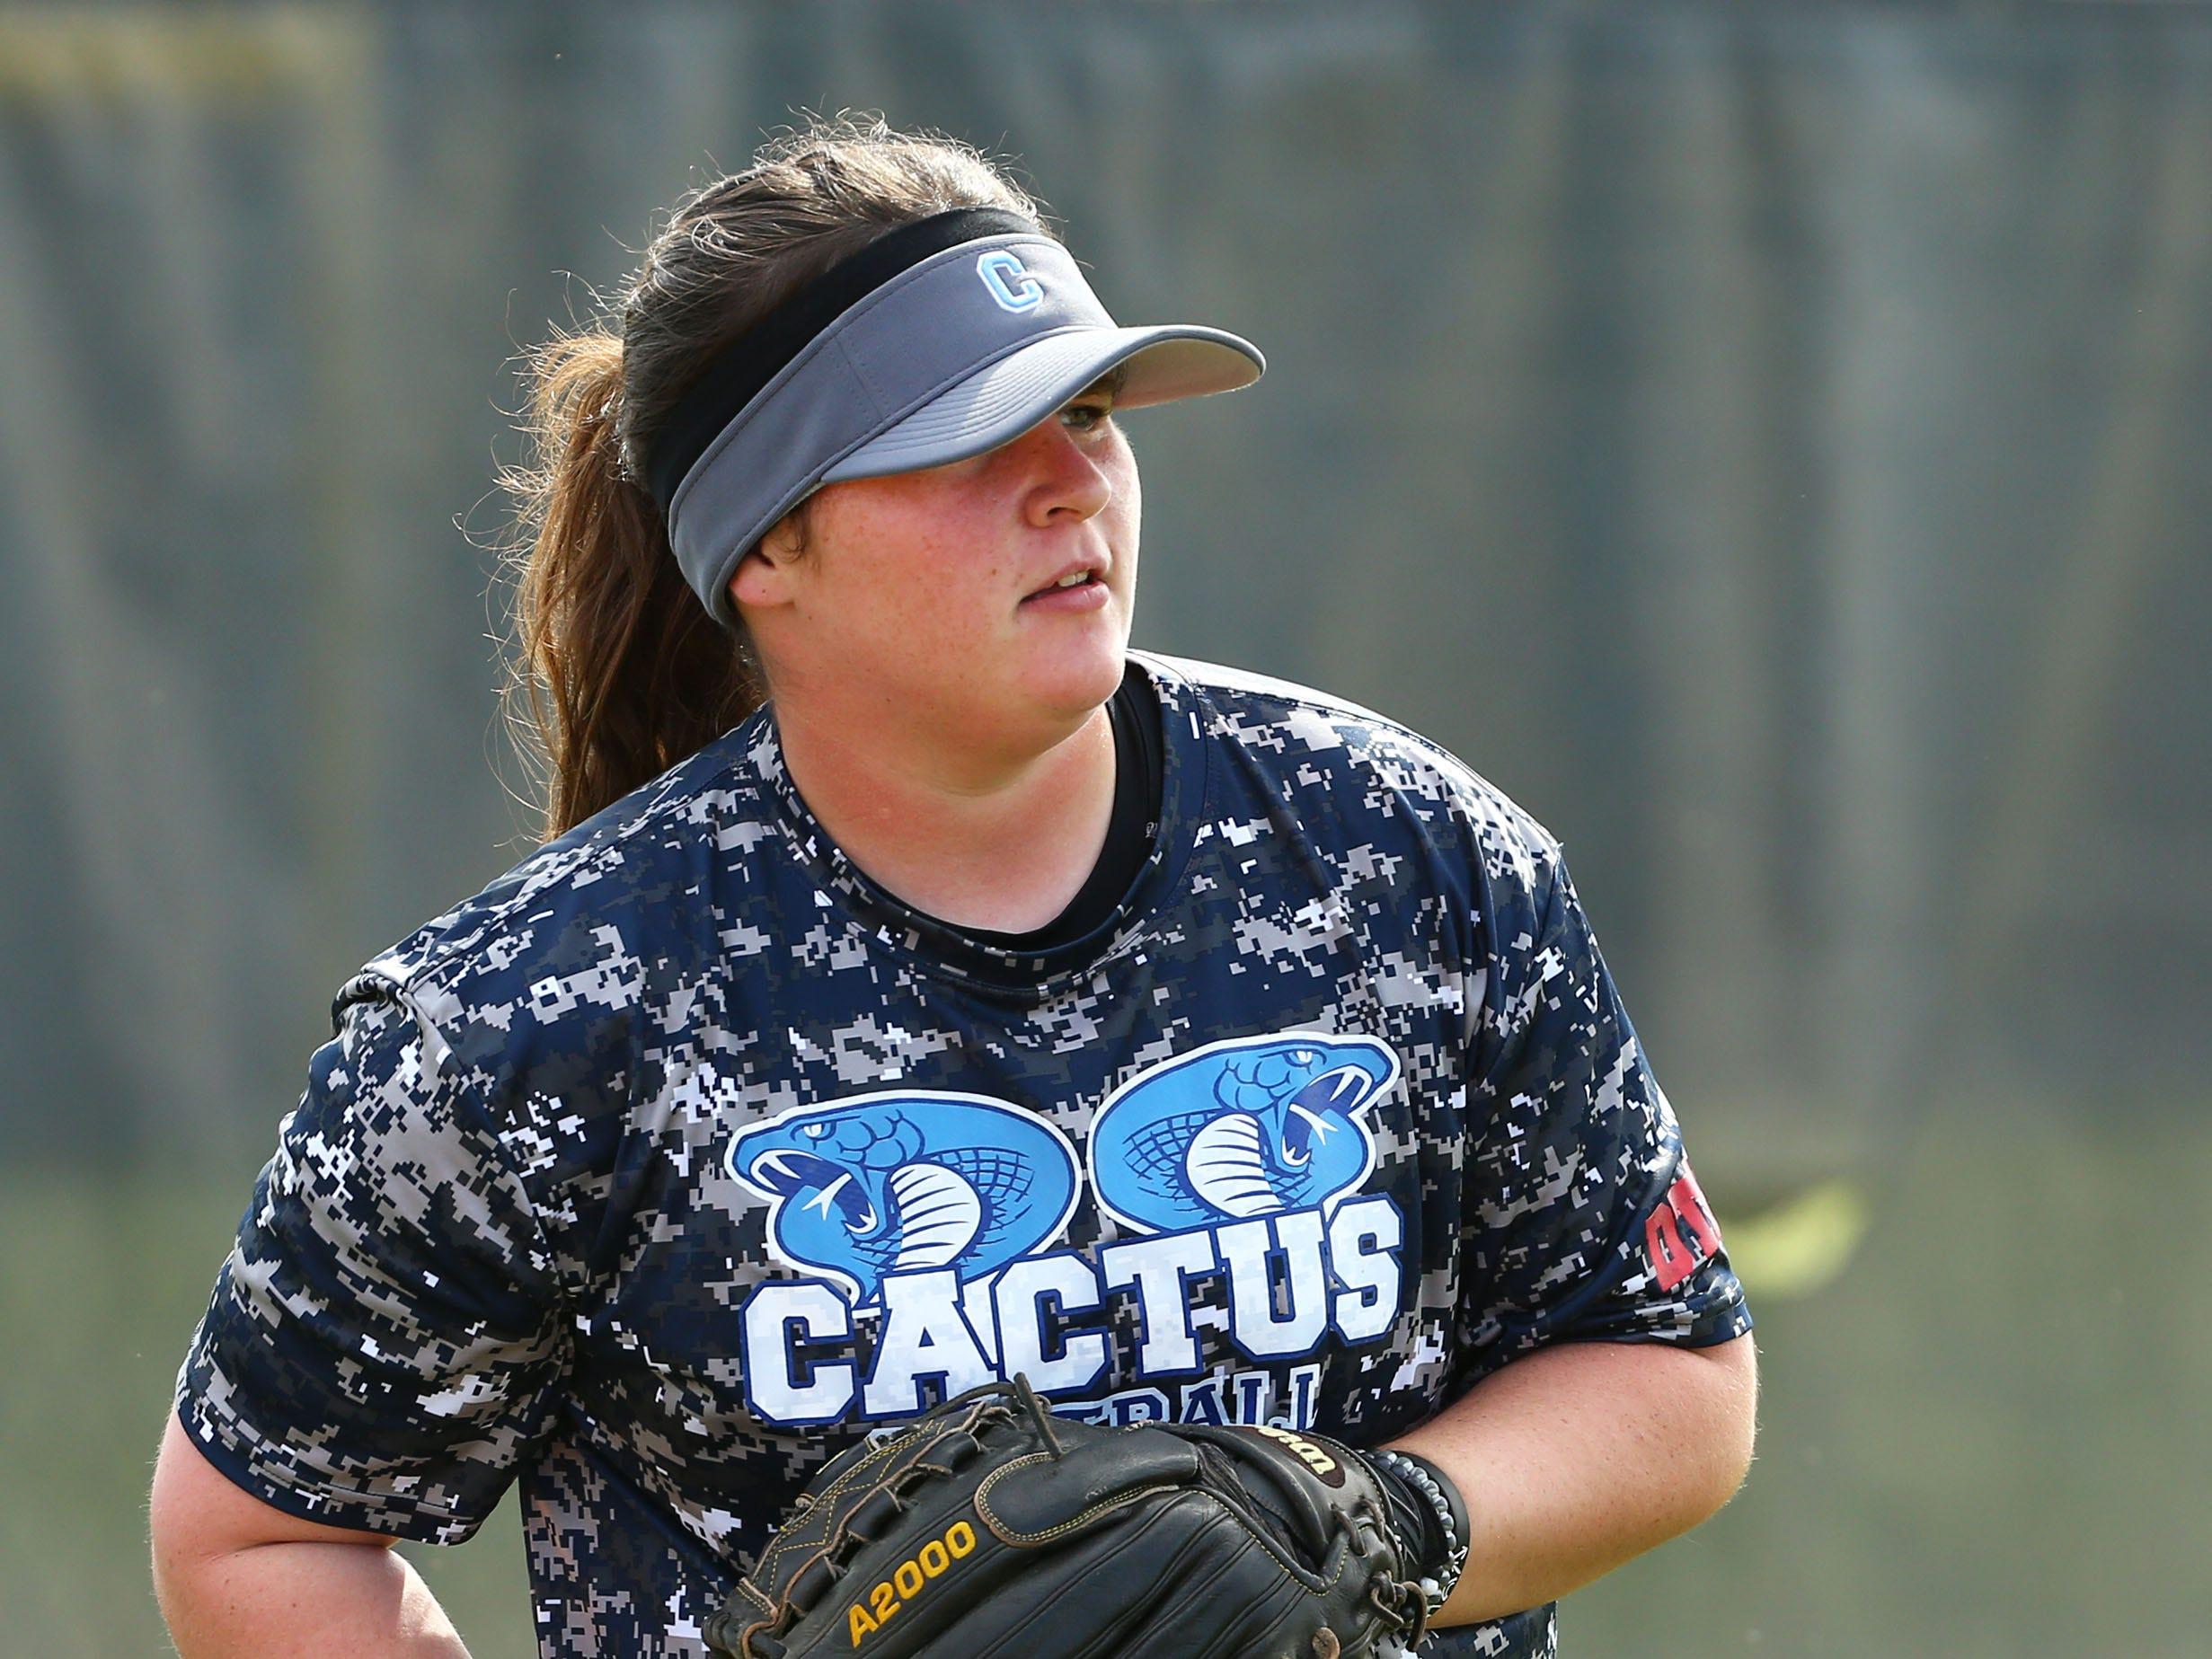 Cactus High softball player McKenna Feringa during practice on Apr. 2, 2019 at Cactus High School in Glendale, Ariz.